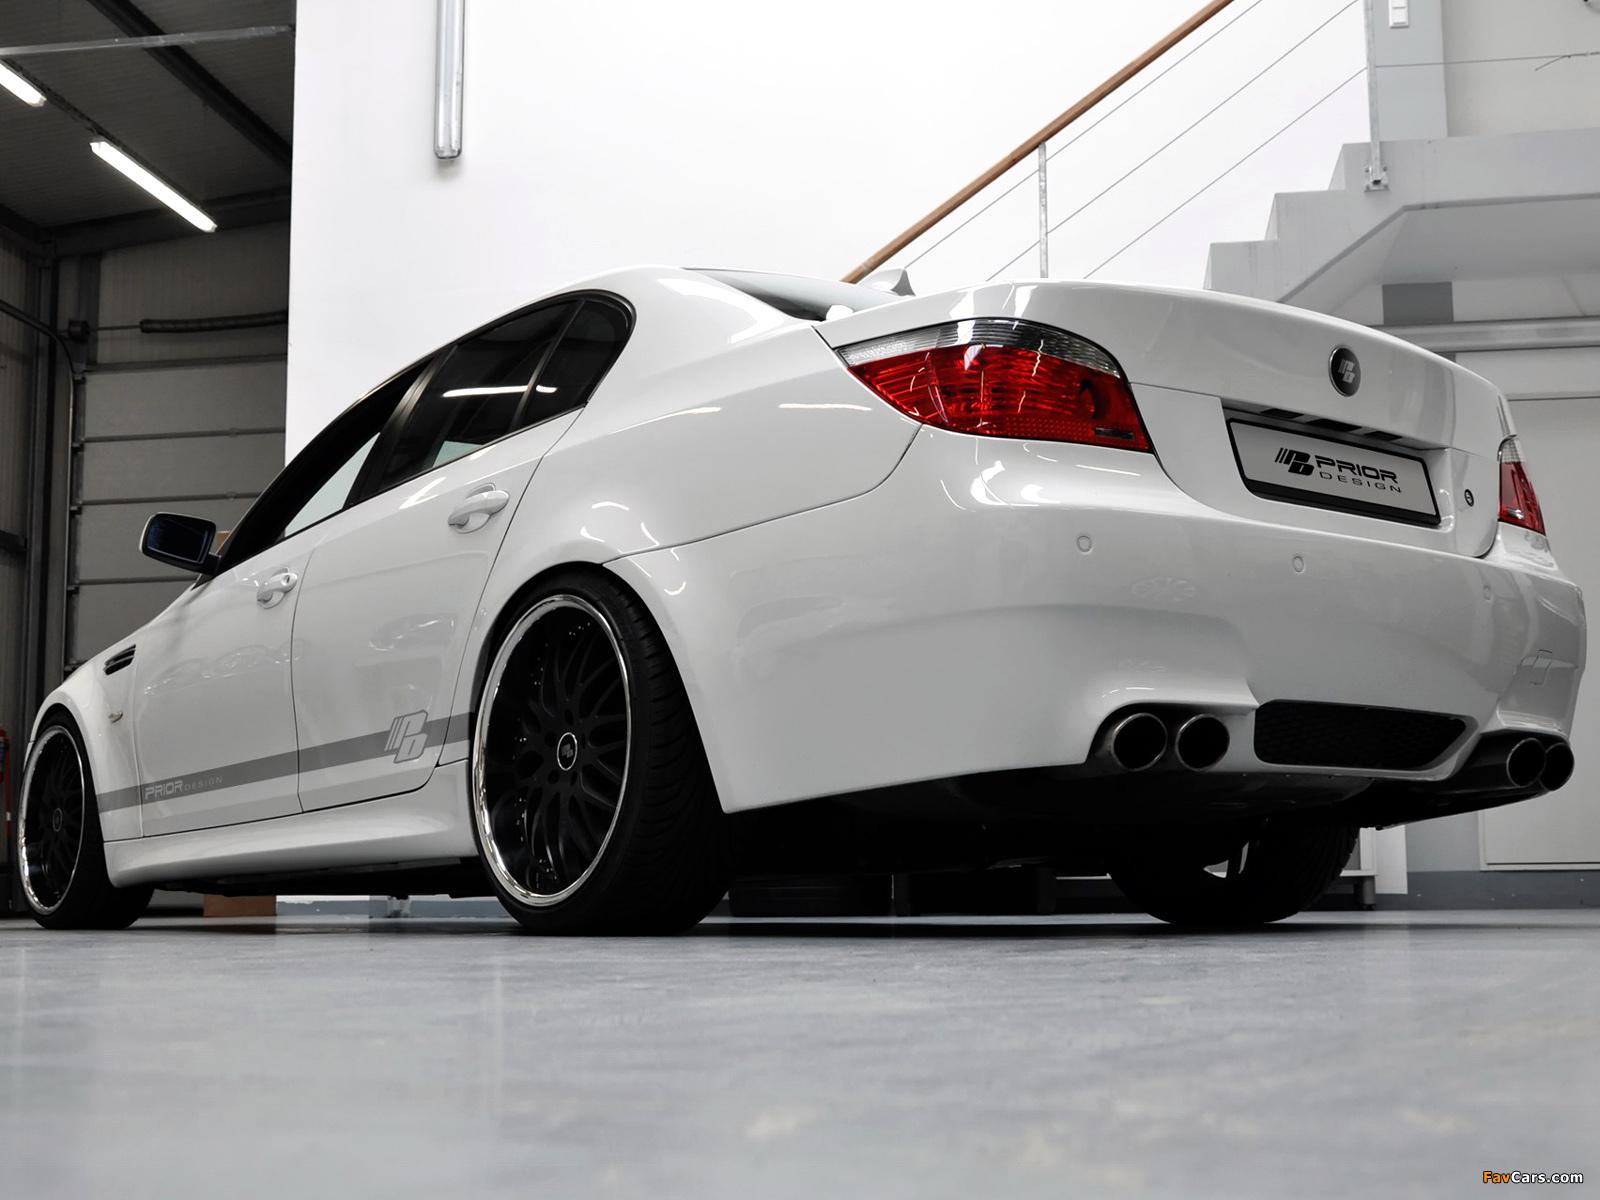 Prior-Design BMW M5 Sedan (E60) 2009-10 wallpapers (1600x1200)